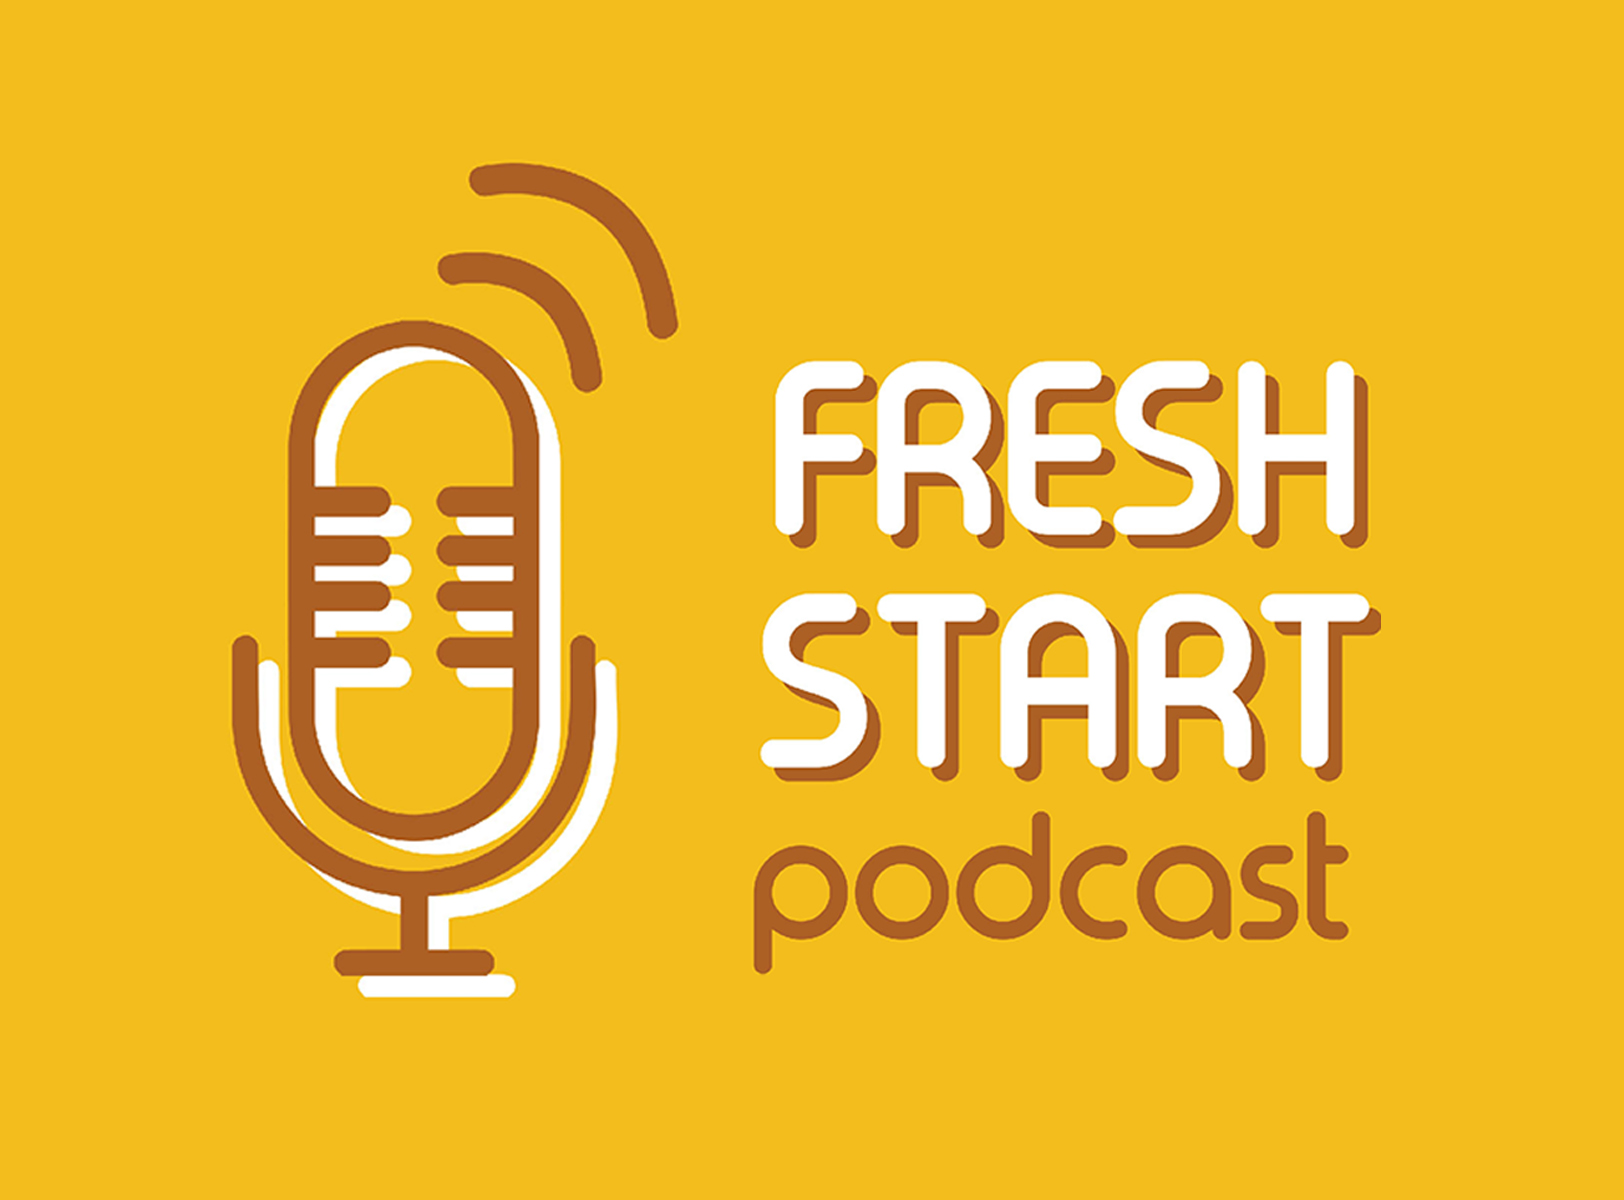 Fresh Start: Podcast News (4/22/2020 Wed.)